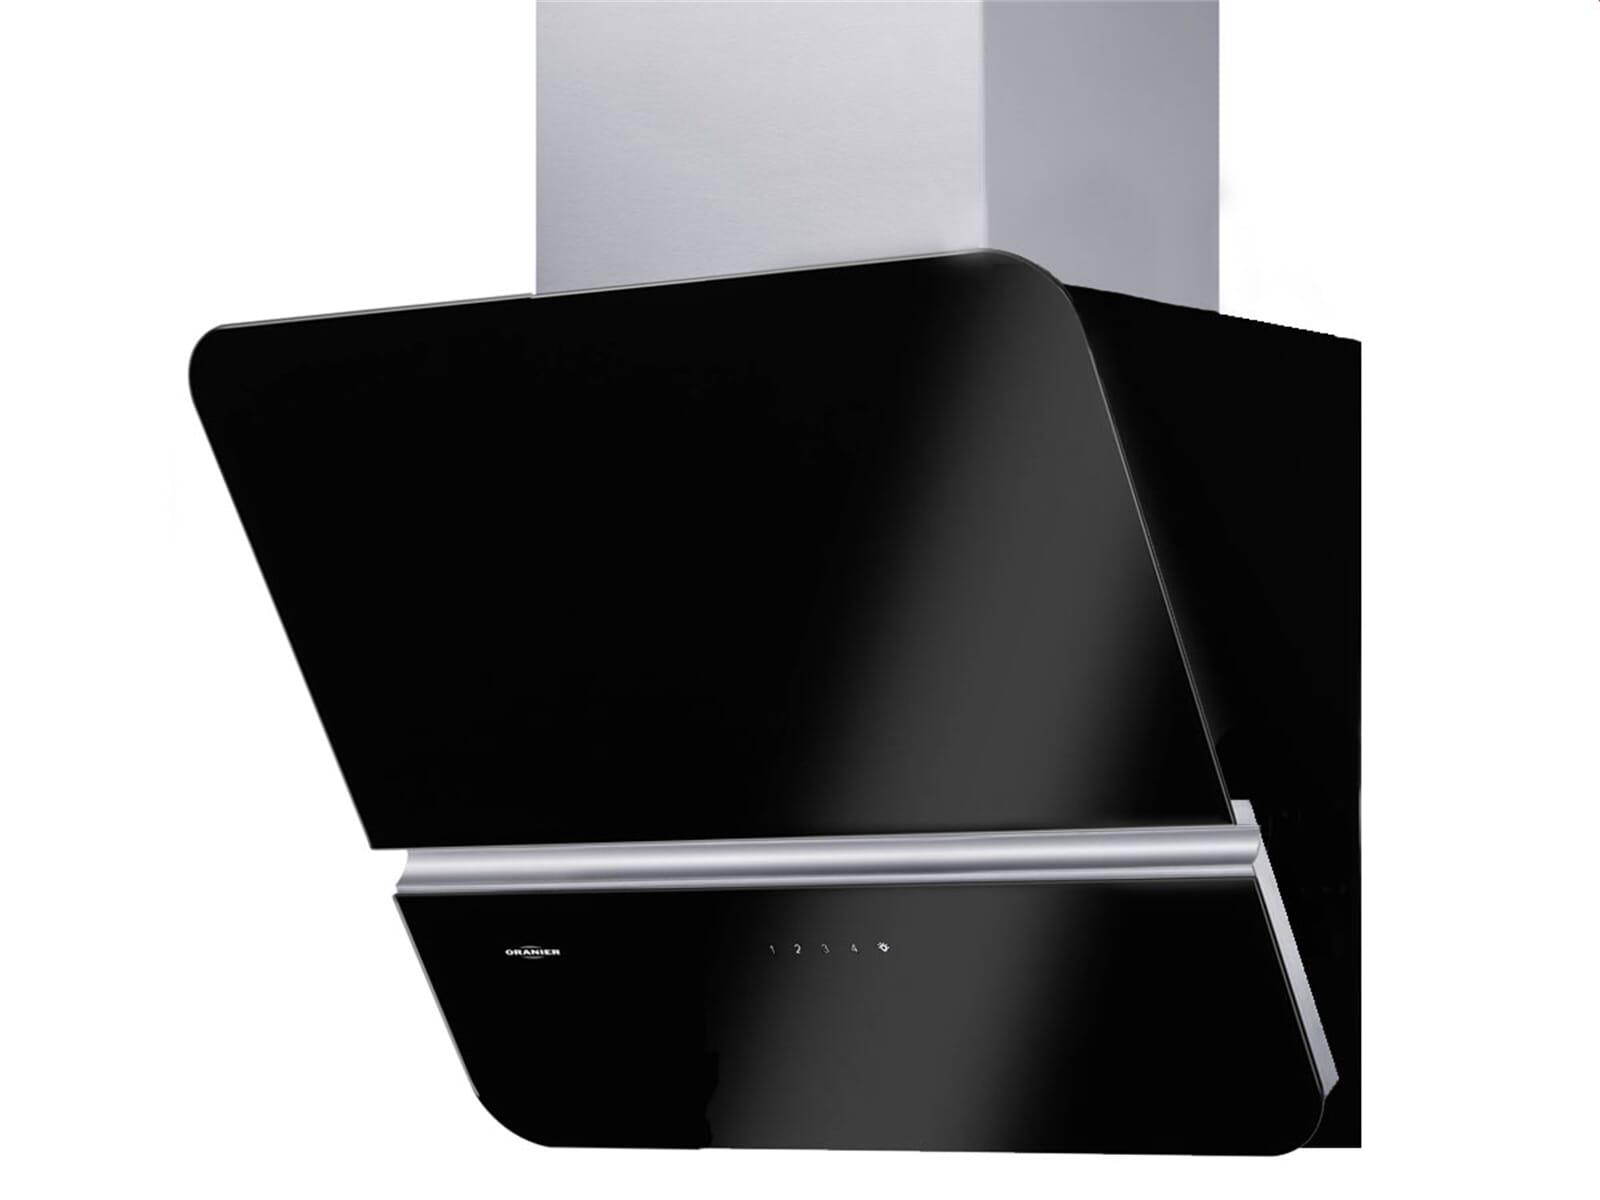 oranier signa 60 s 8623 60 kopffreihaube schwarz. Black Bedroom Furniture Sets. Home Design Ideas